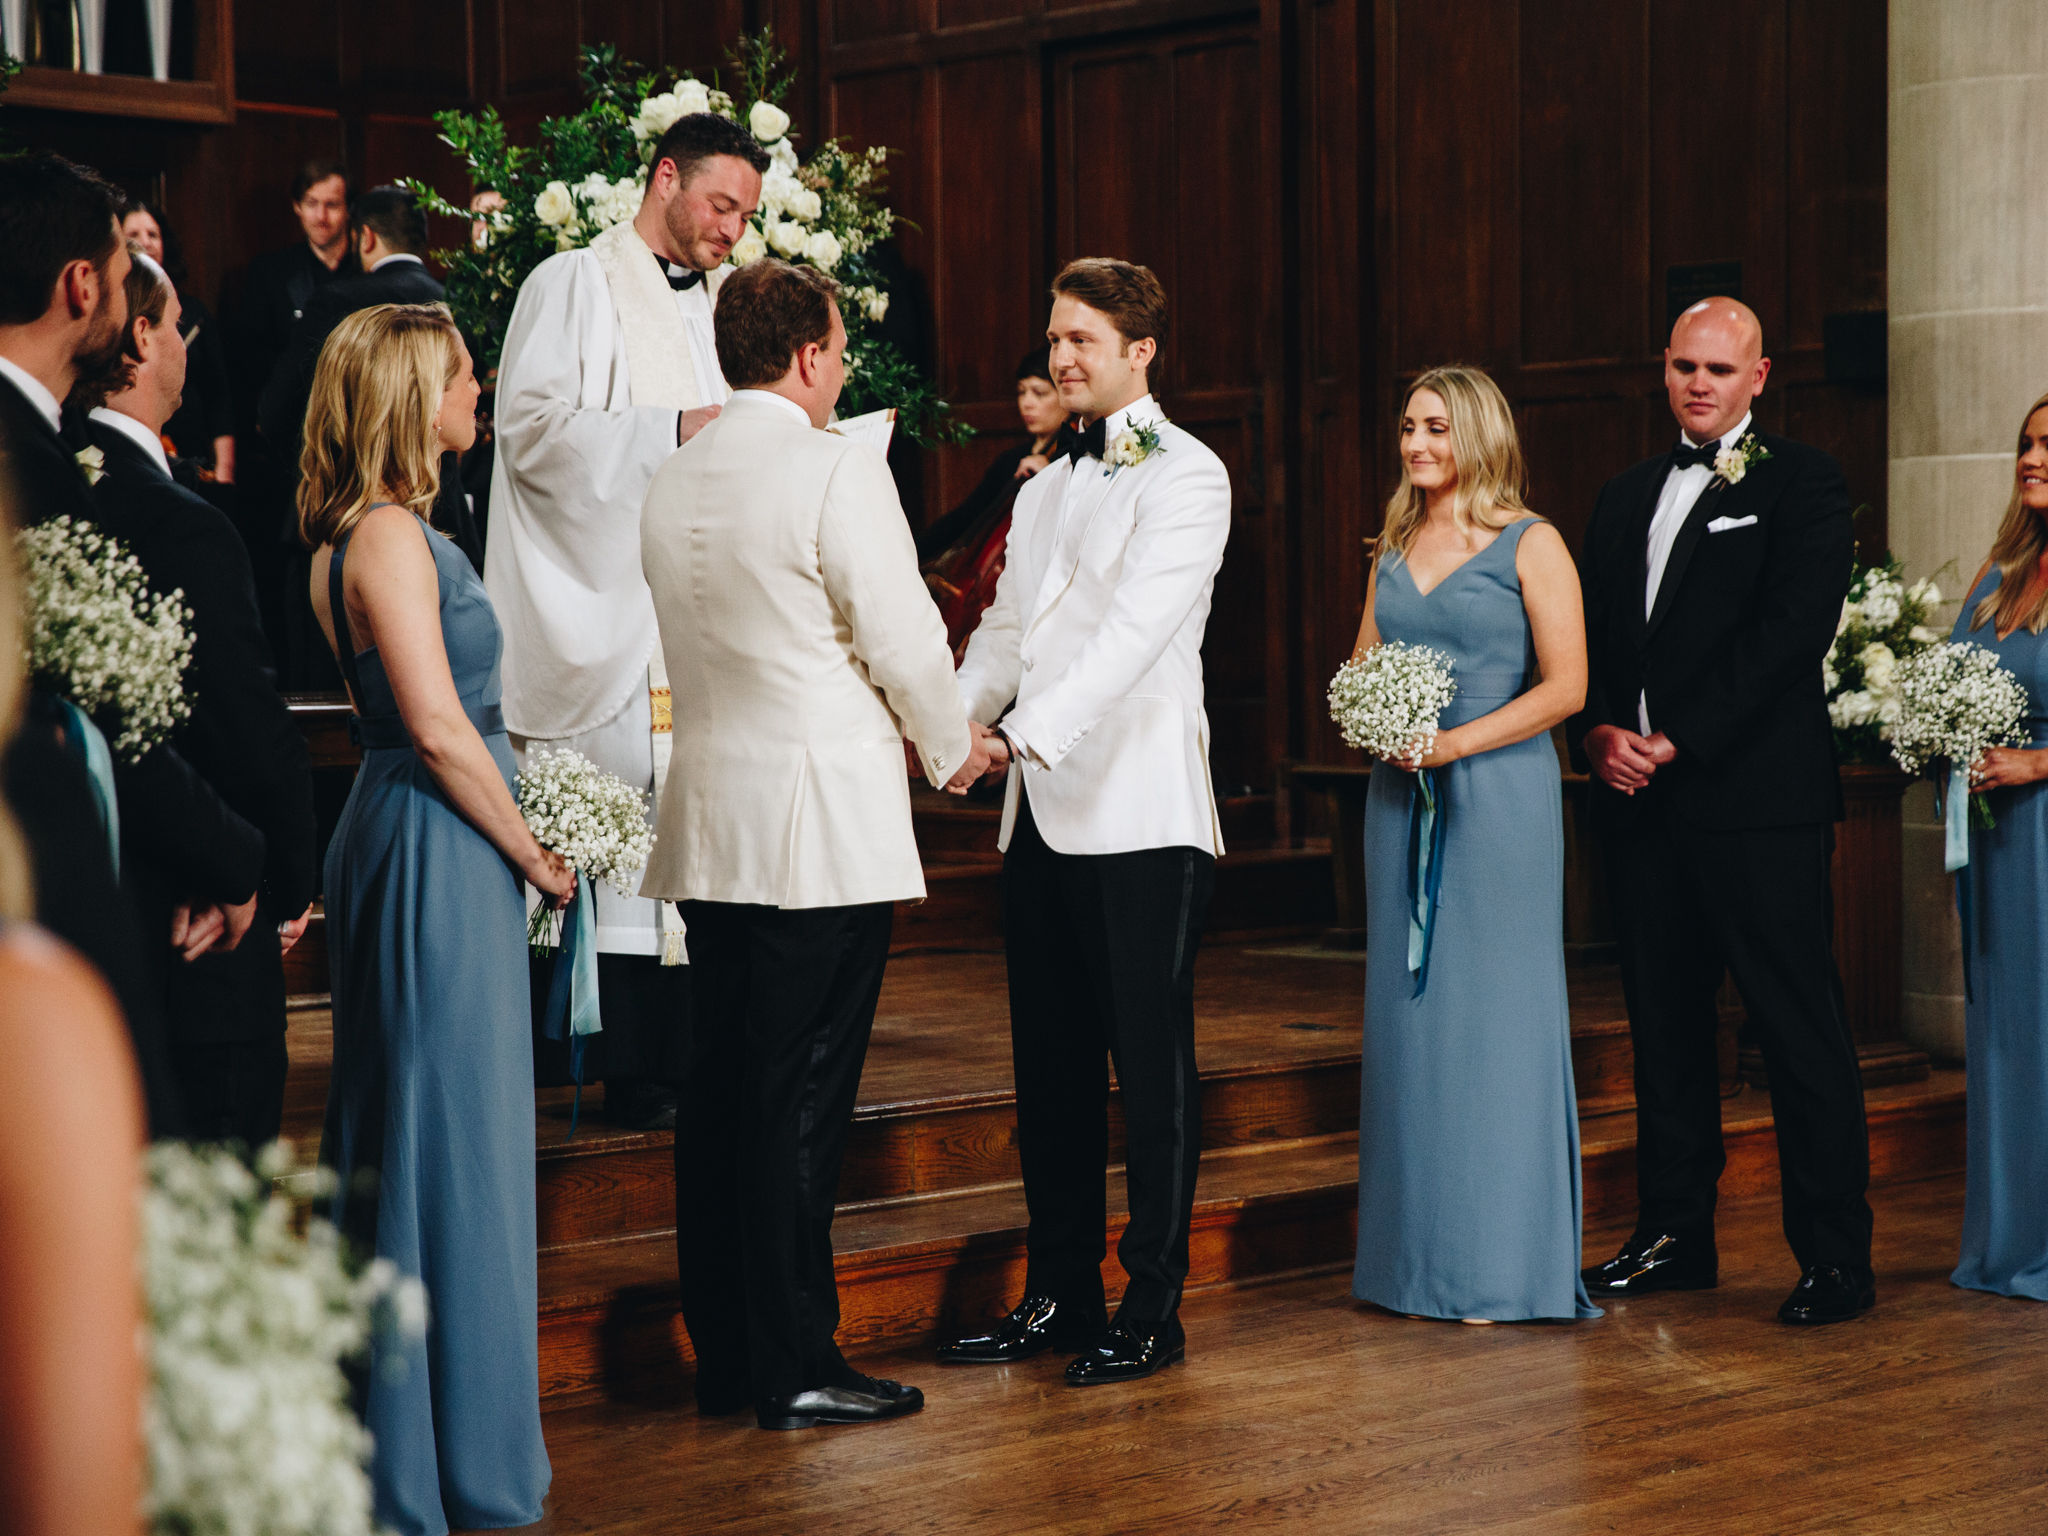 Two grooms marrying in Wightman Chapel